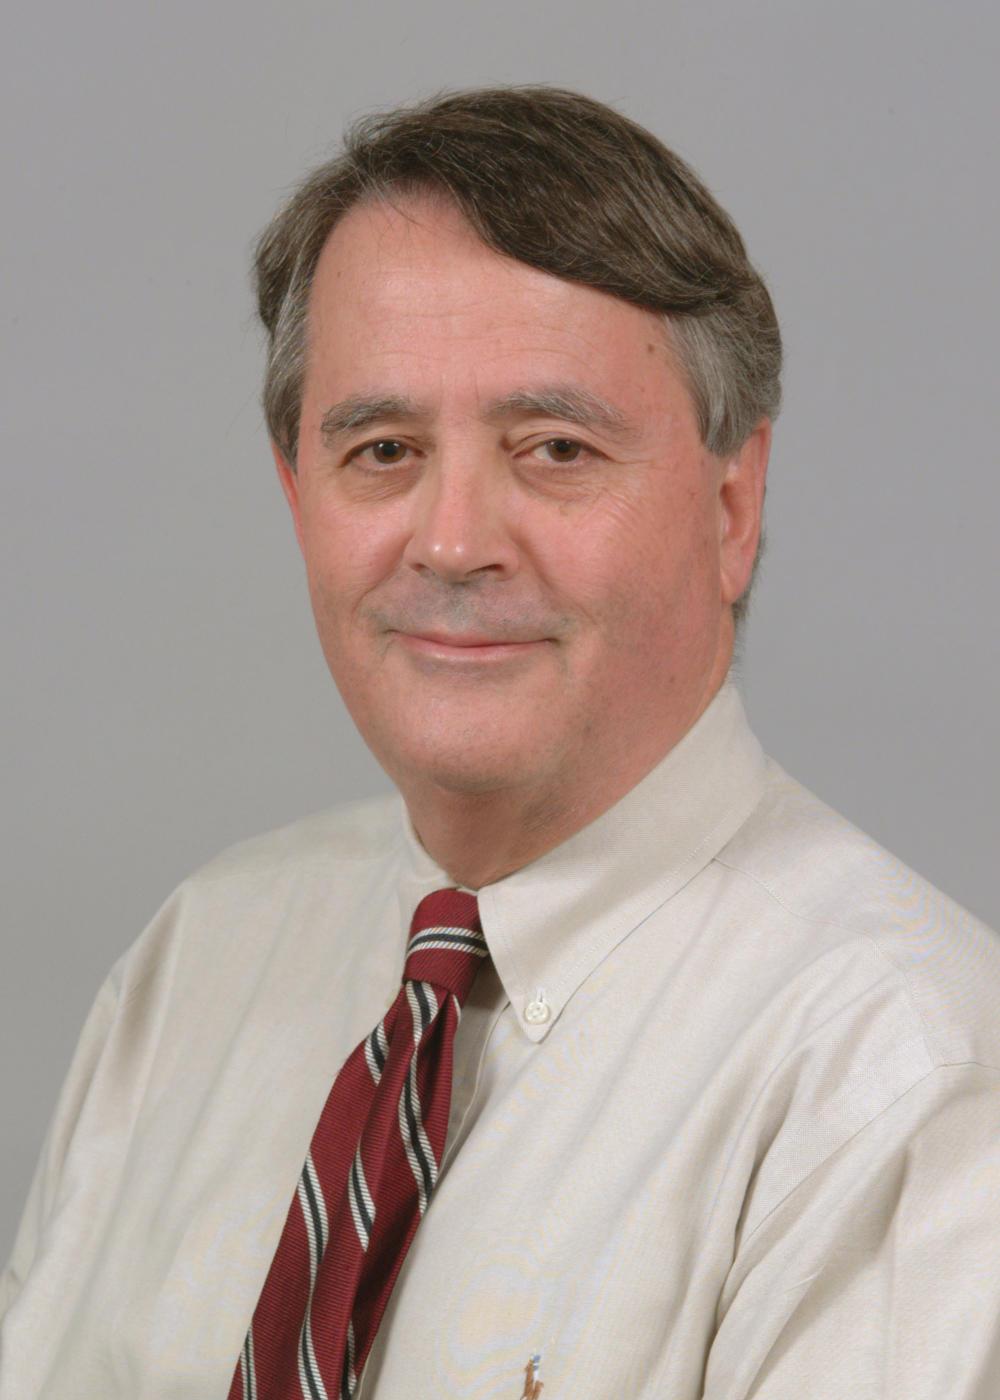 Paul B Pritchard, IIi MD